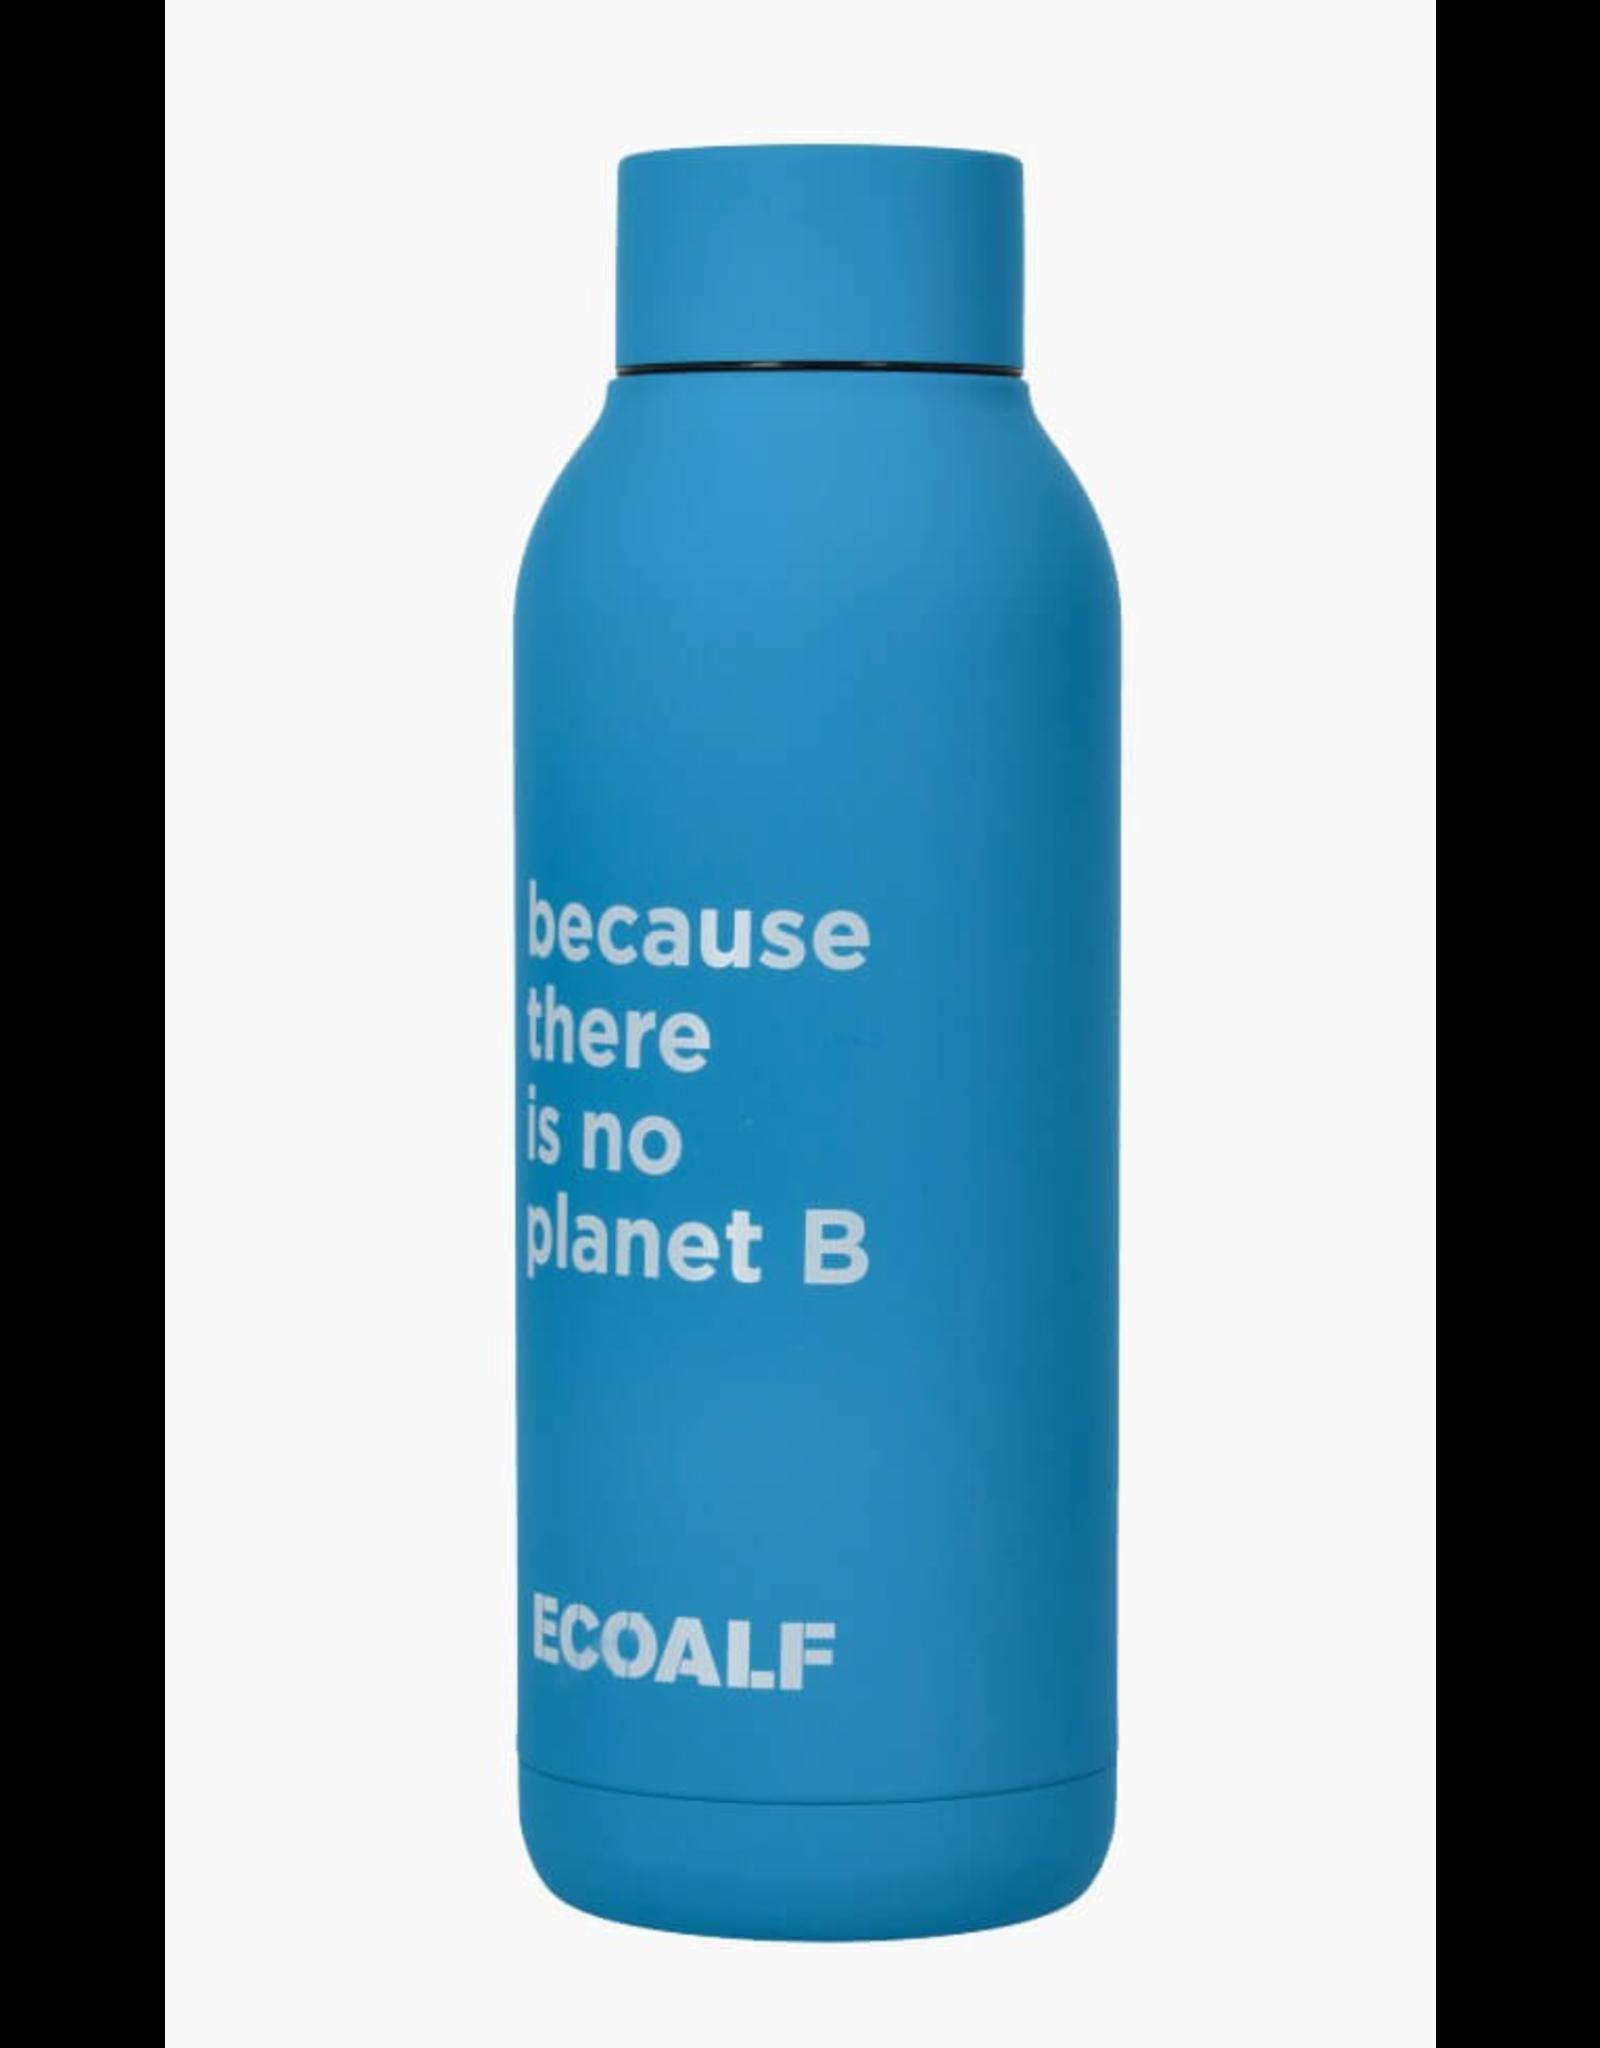 Ecoalf Bronson Stainless Steele Bottle